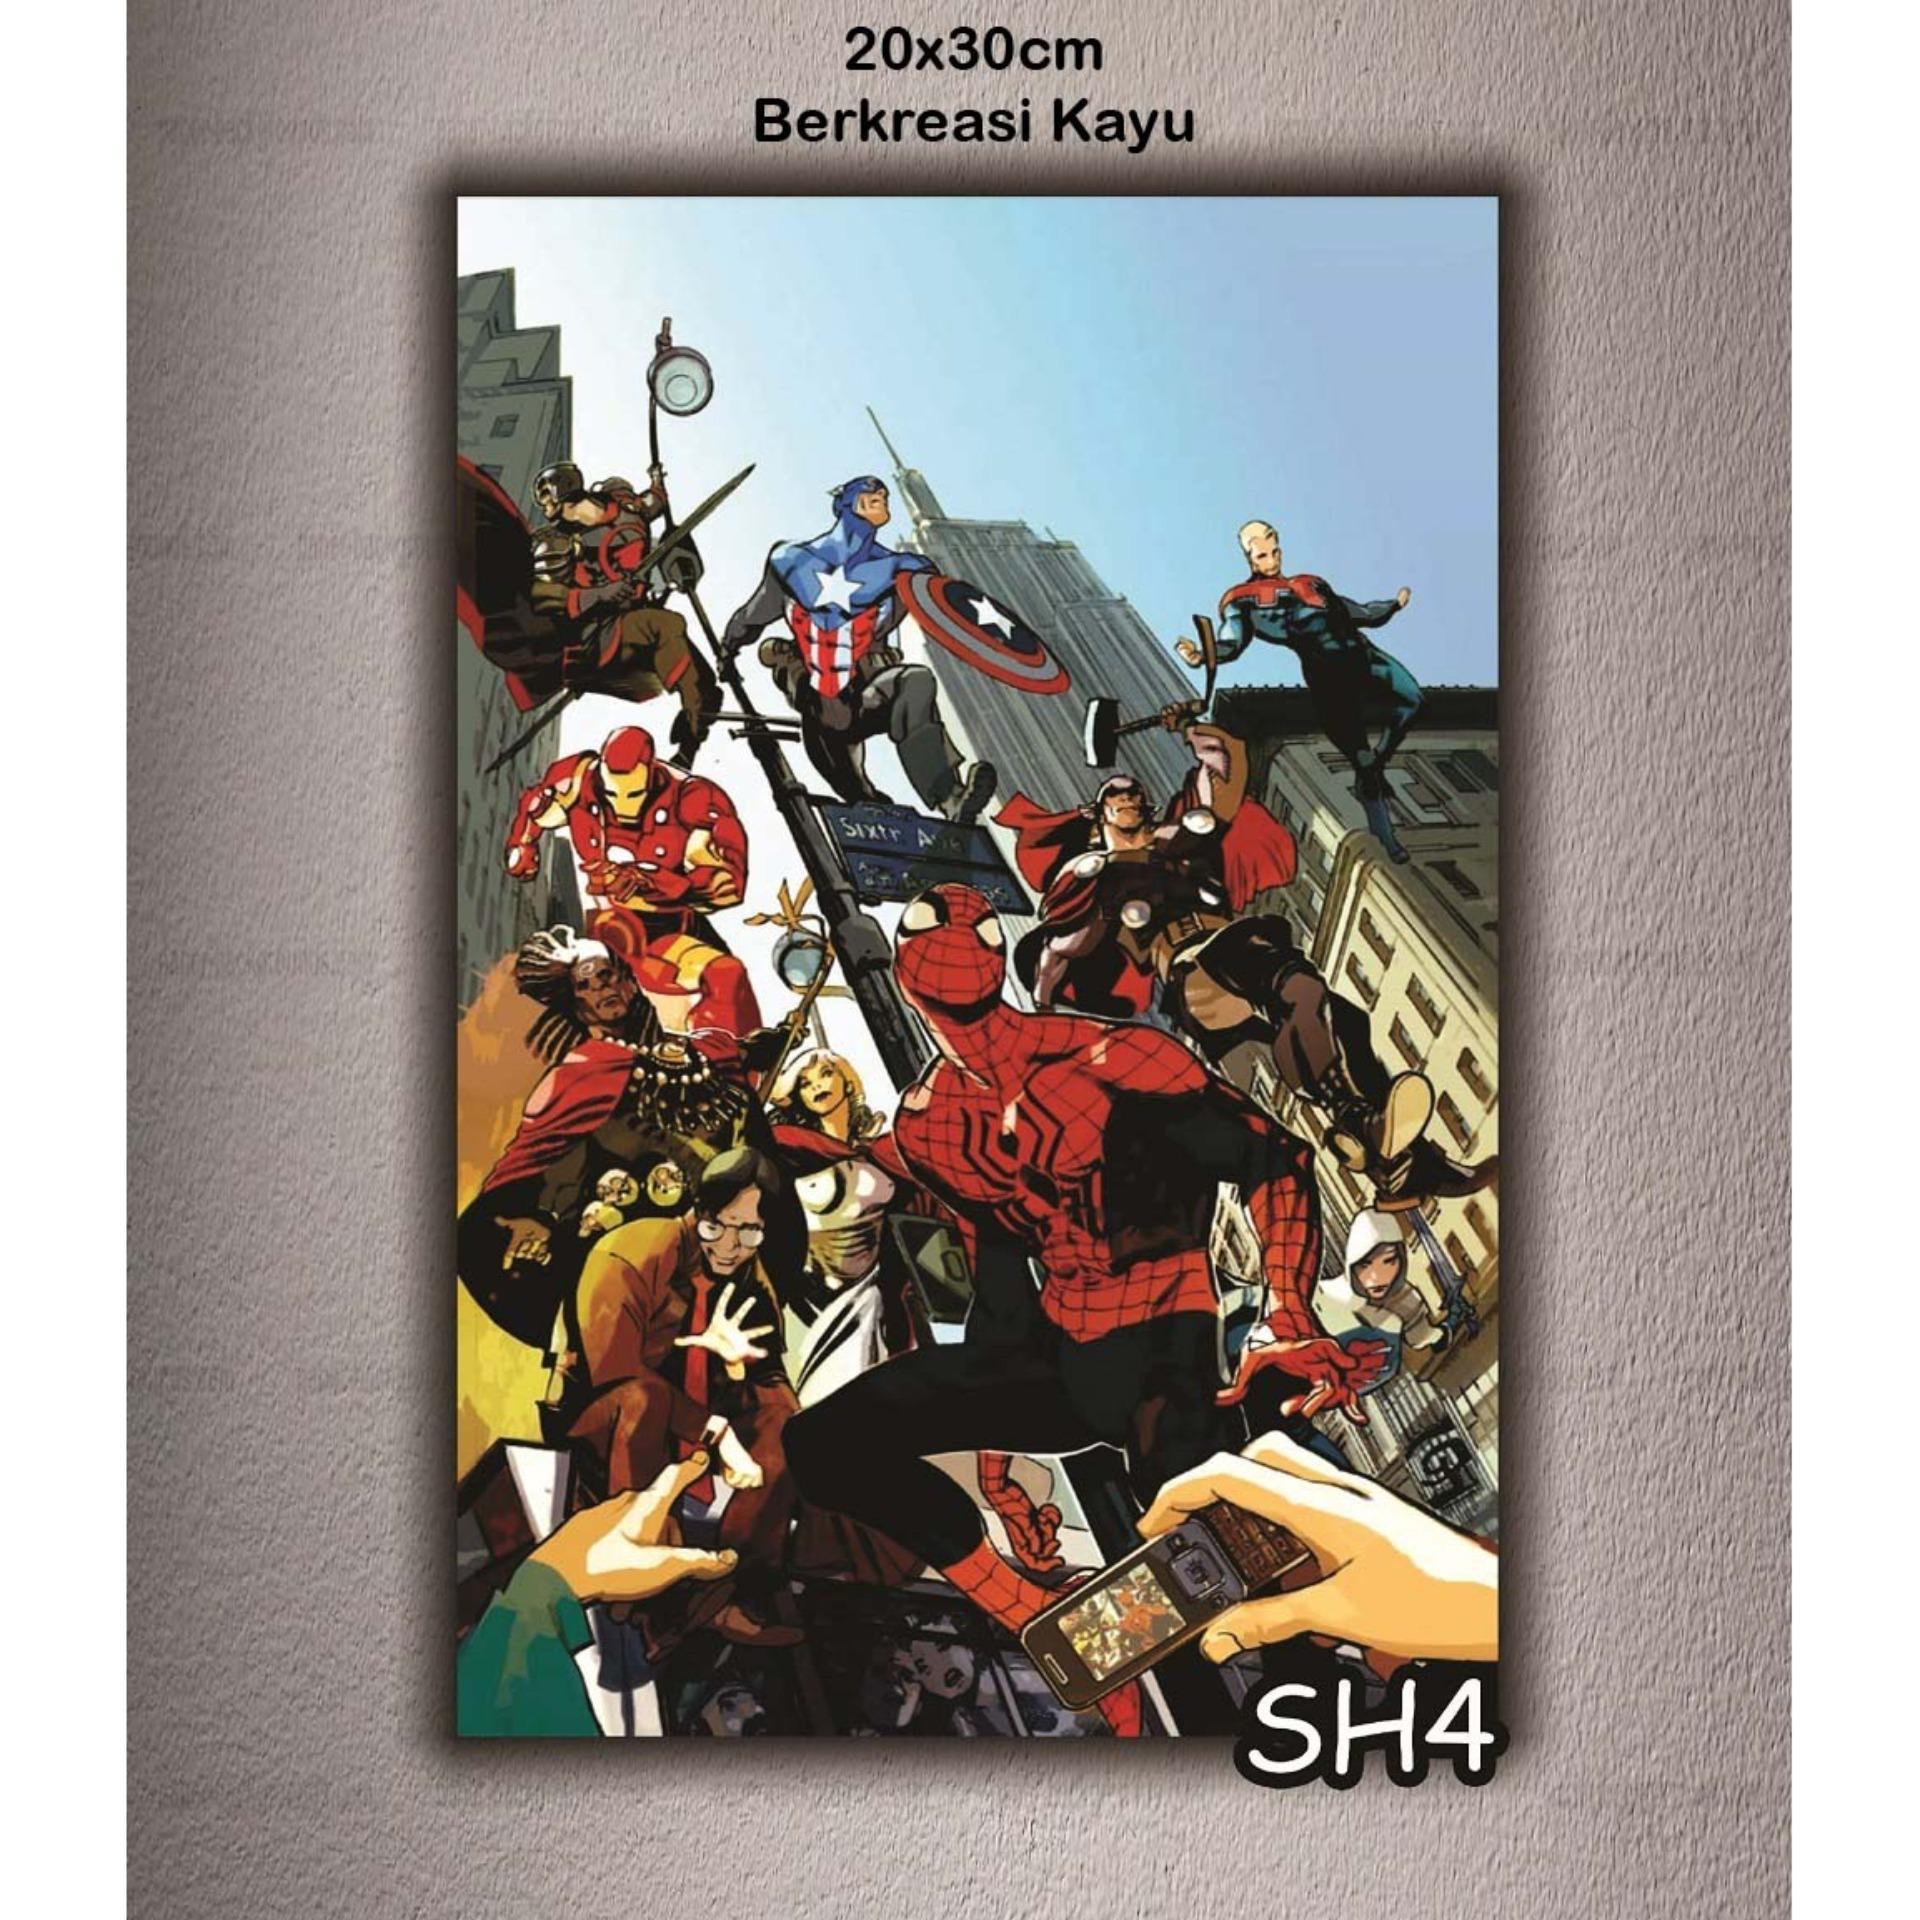 Vasty Hiasan Dinding Kayu Wall Decor Poster Super Hero Kode VSH-04